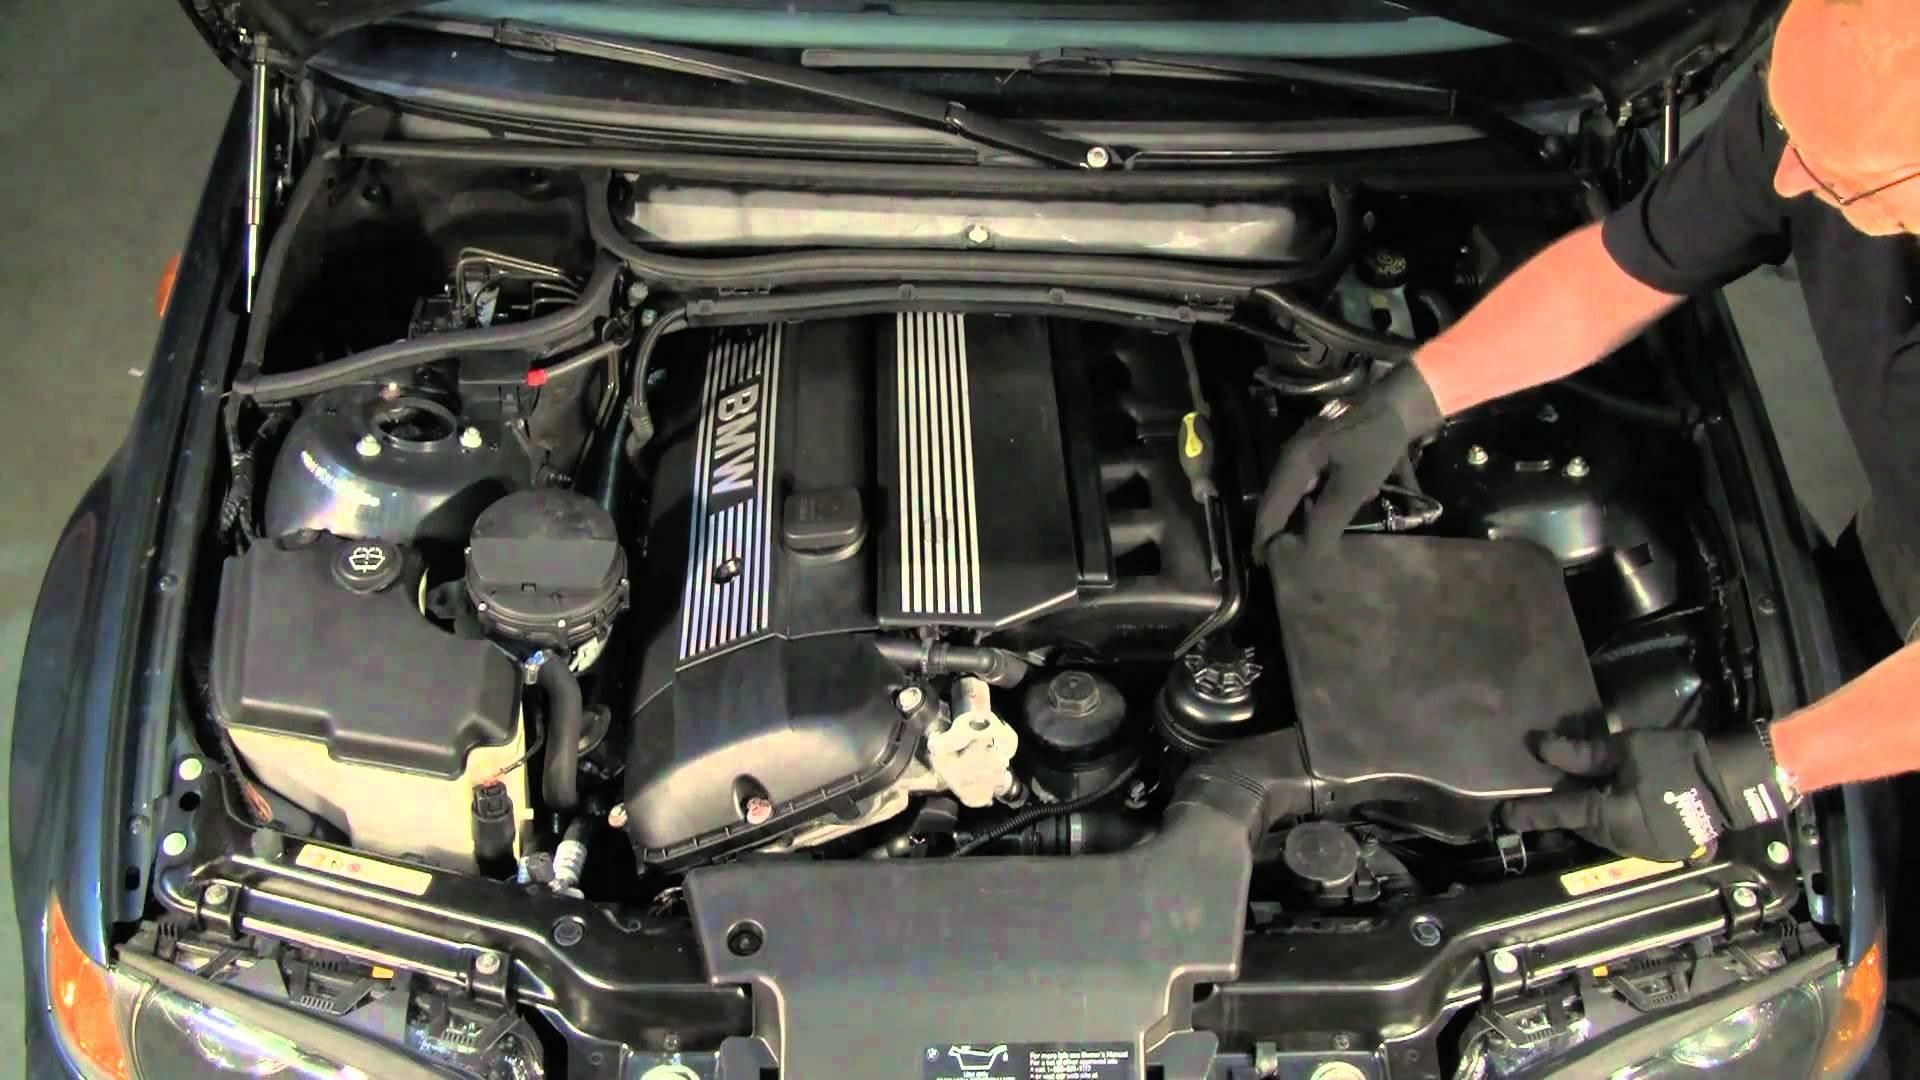 hight resolution of 2001 bmw 330ci engine diagram under the hood a bmw 3 series 99 thru 05 of